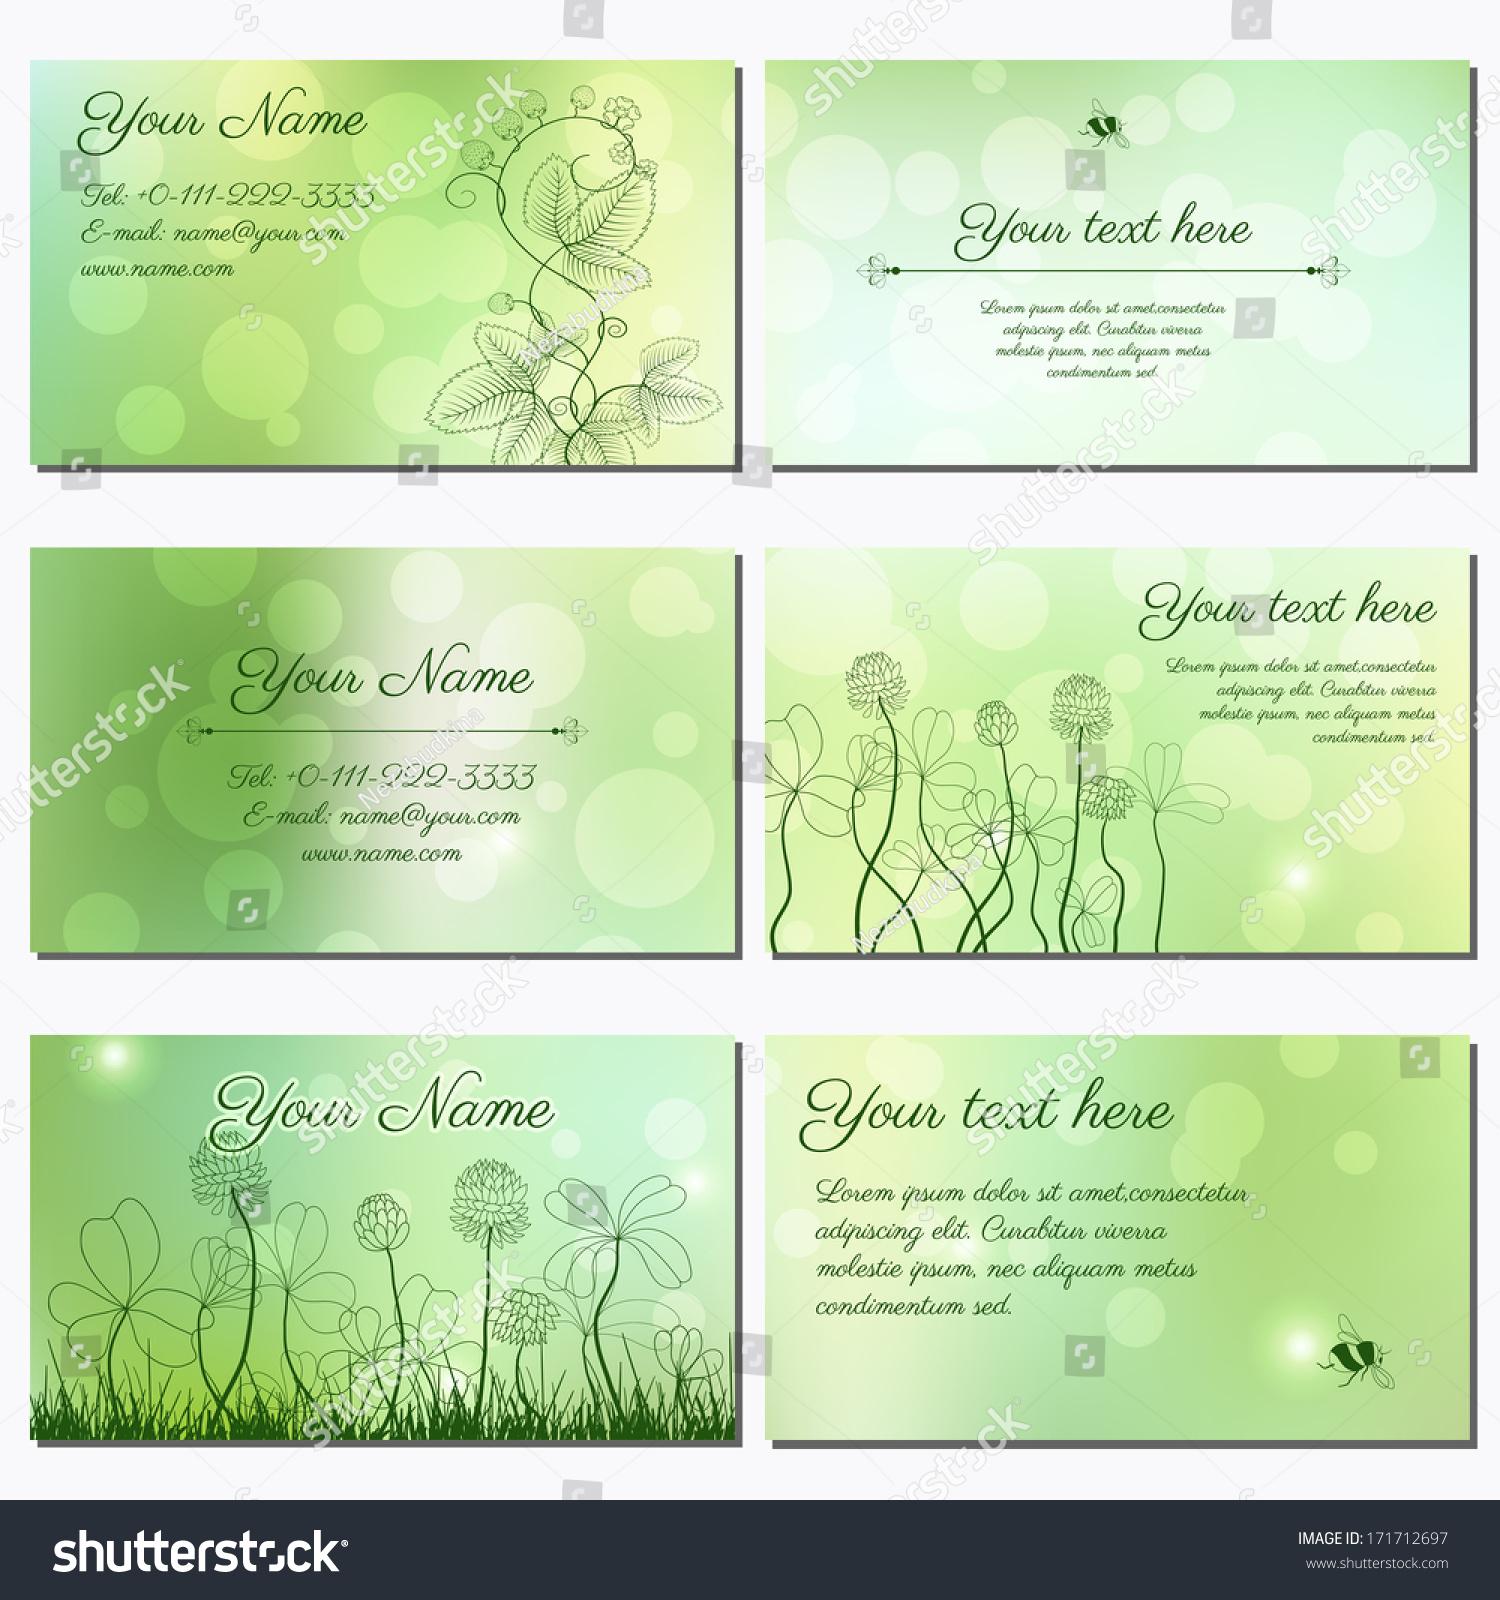 Set Six Horizontal Business Cards Spring Stock Vector 171712697 ...